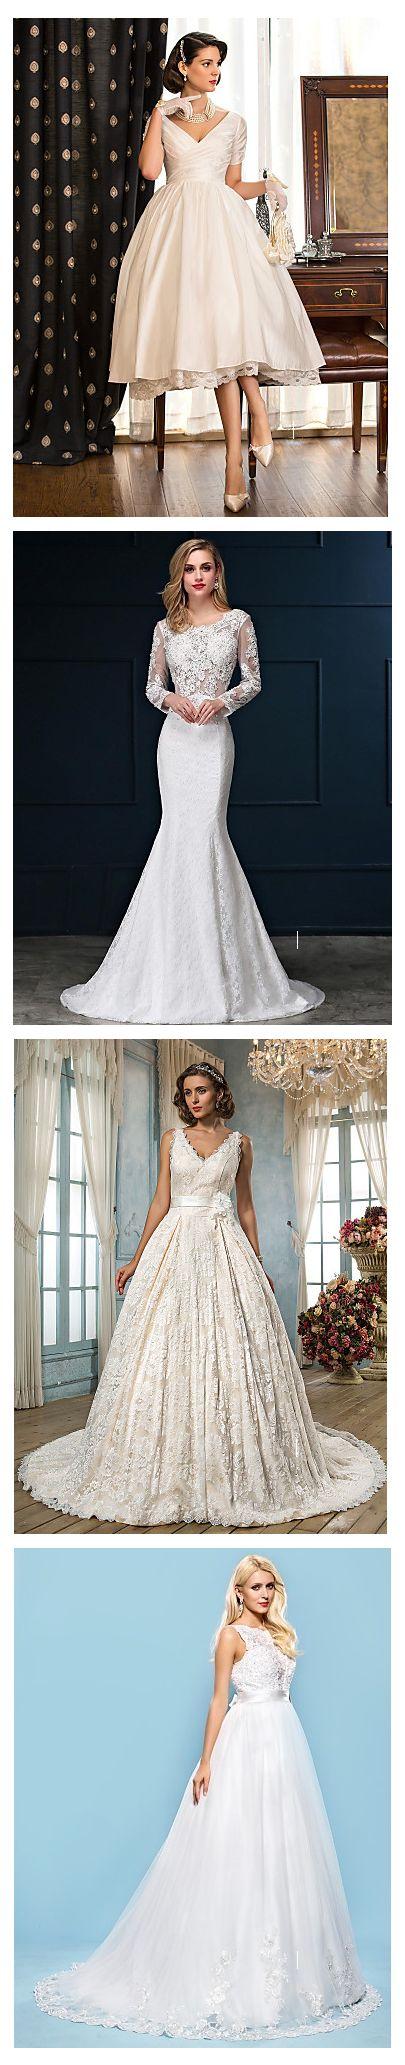 best weddings etc images on pinterest wedding ideas wedding